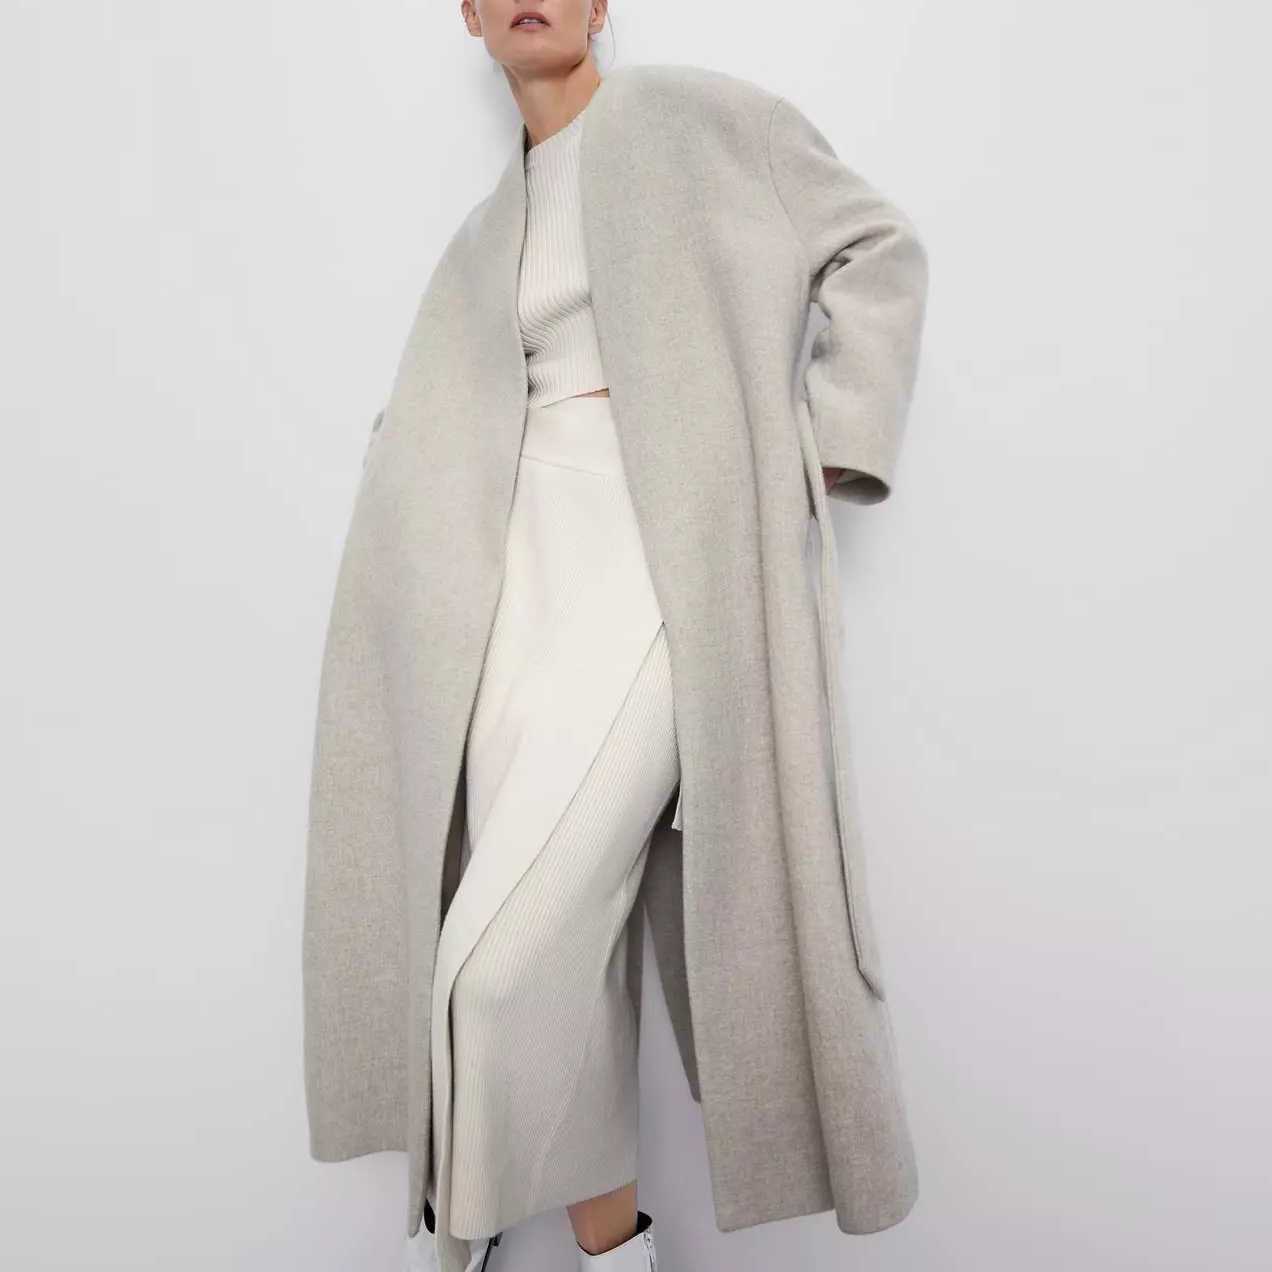 Za outono inverno lã tweed casaco feminino mid-long faixas casual feminino blusão outerwear lã trench parka feminino